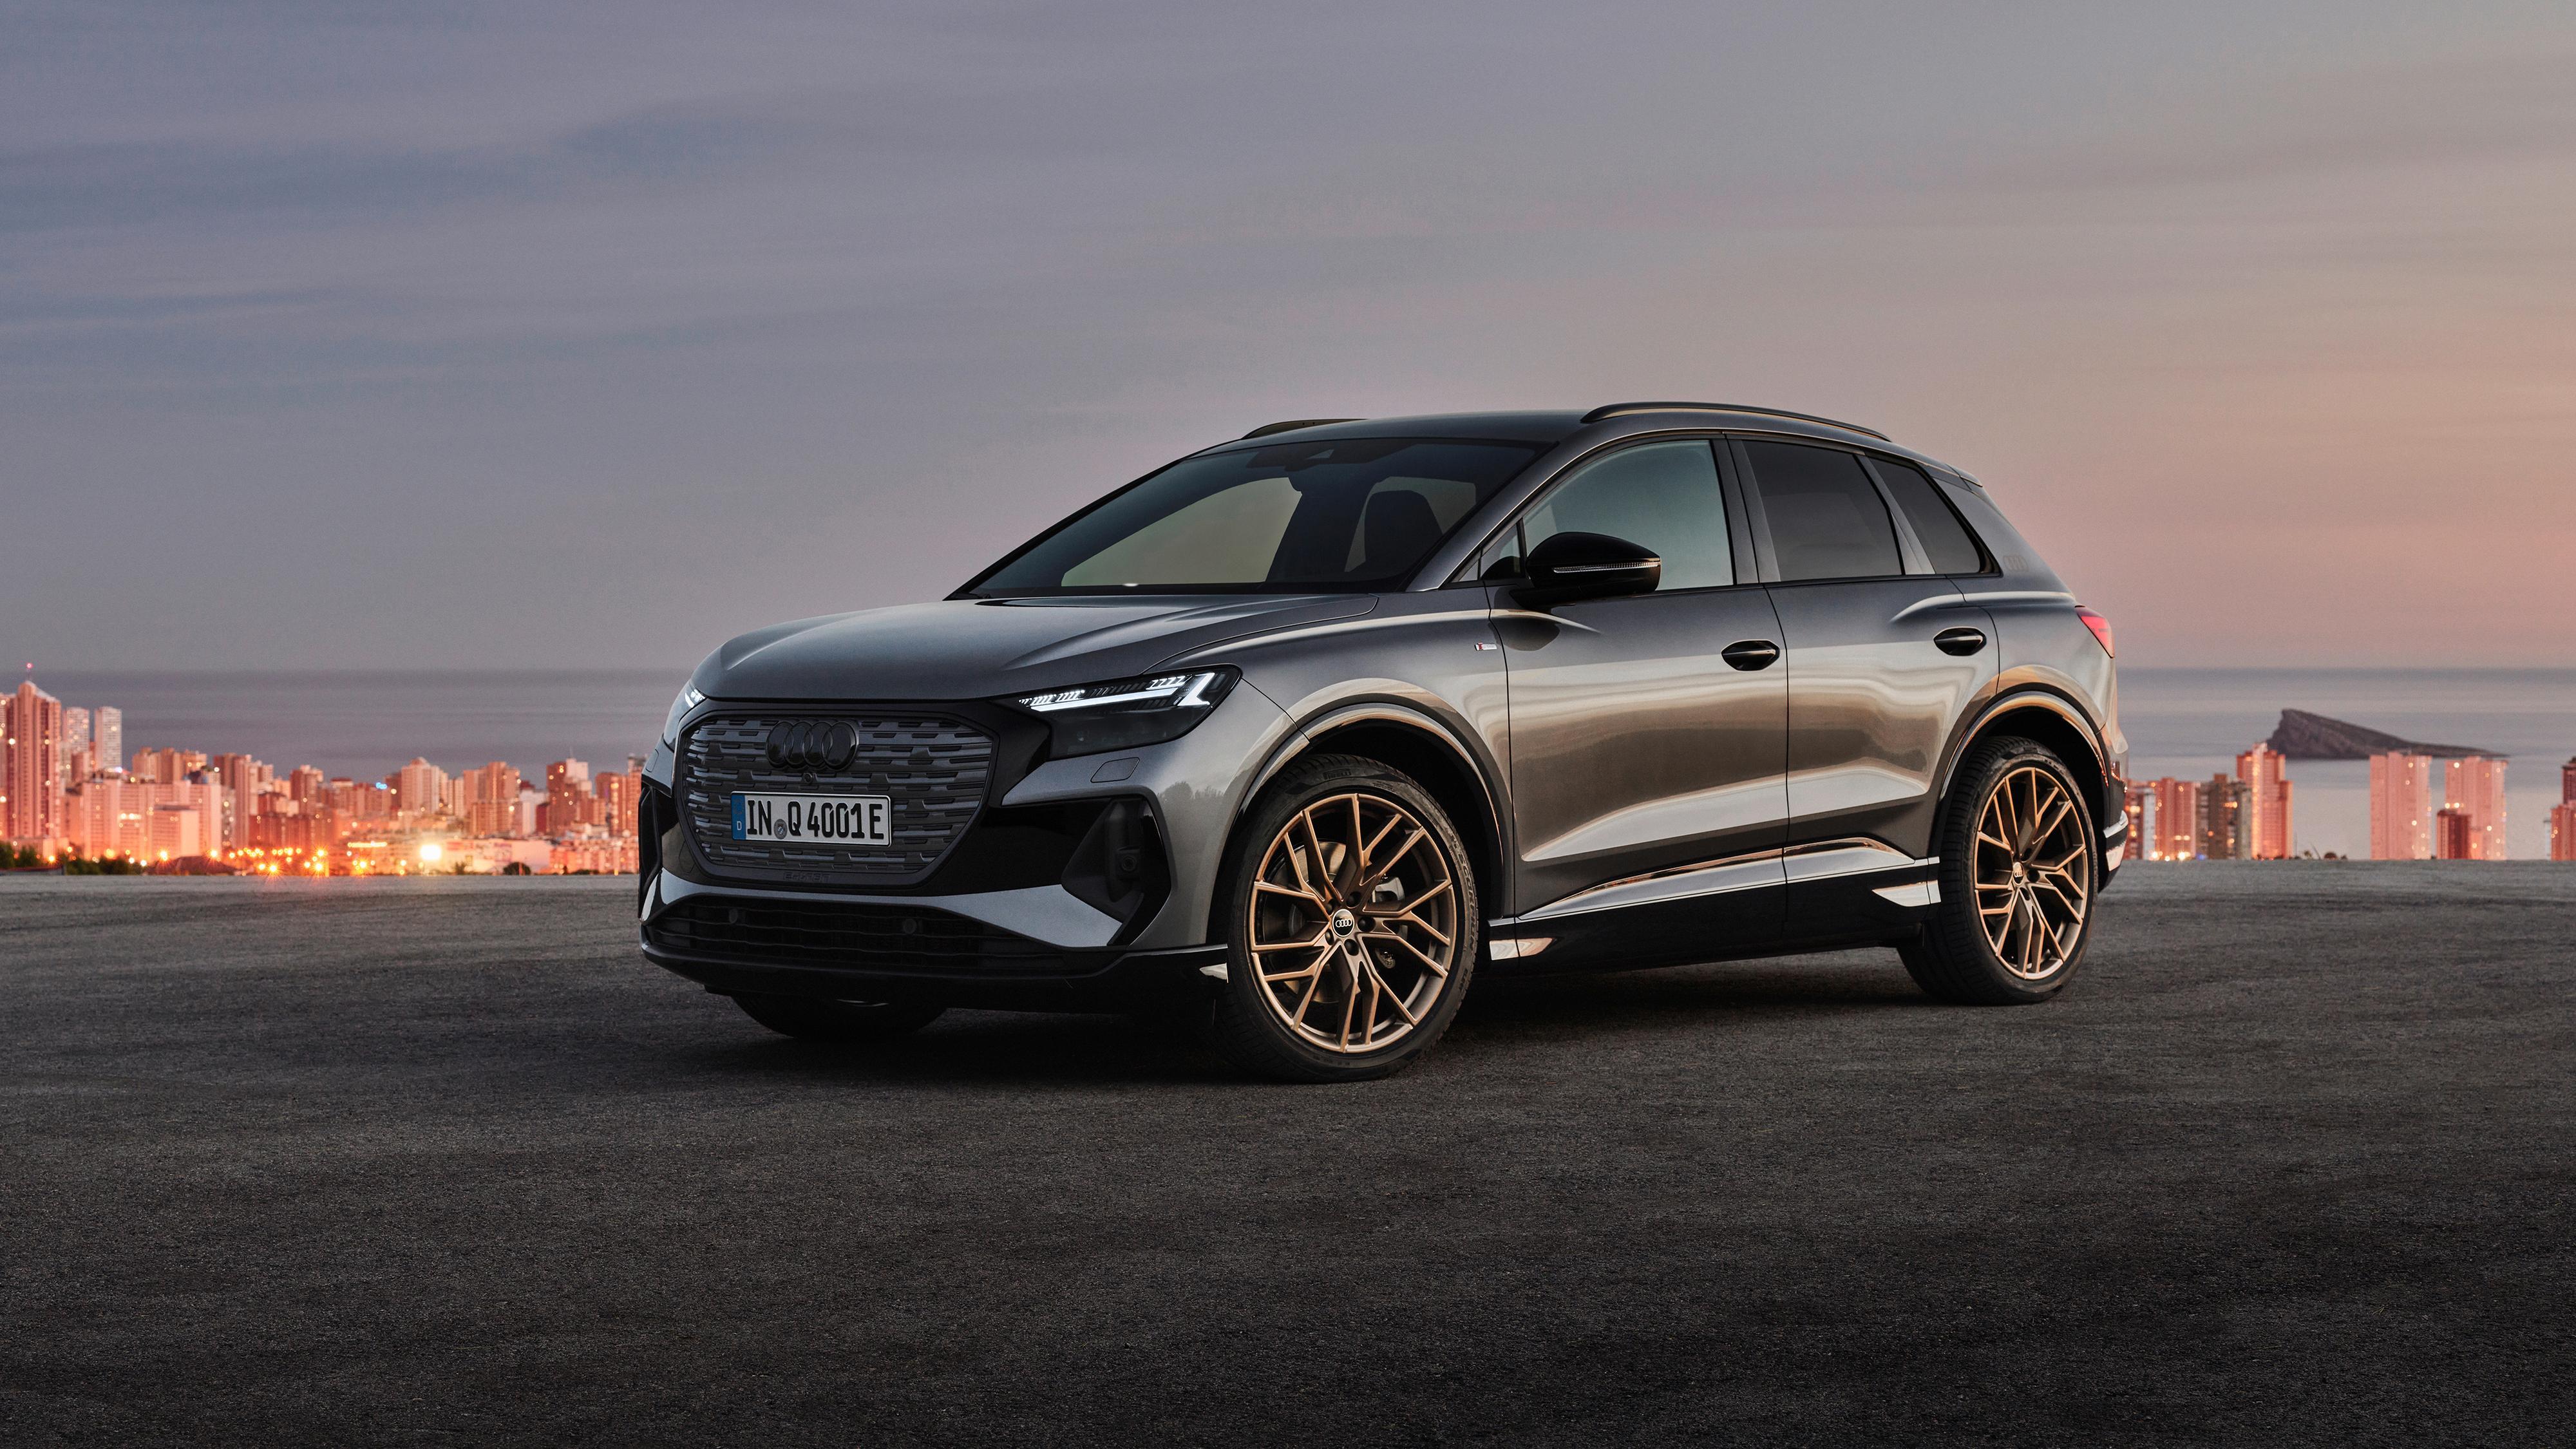 Audis Q4-familie får et nytt medlem - Q4 45 e-tron quattro.